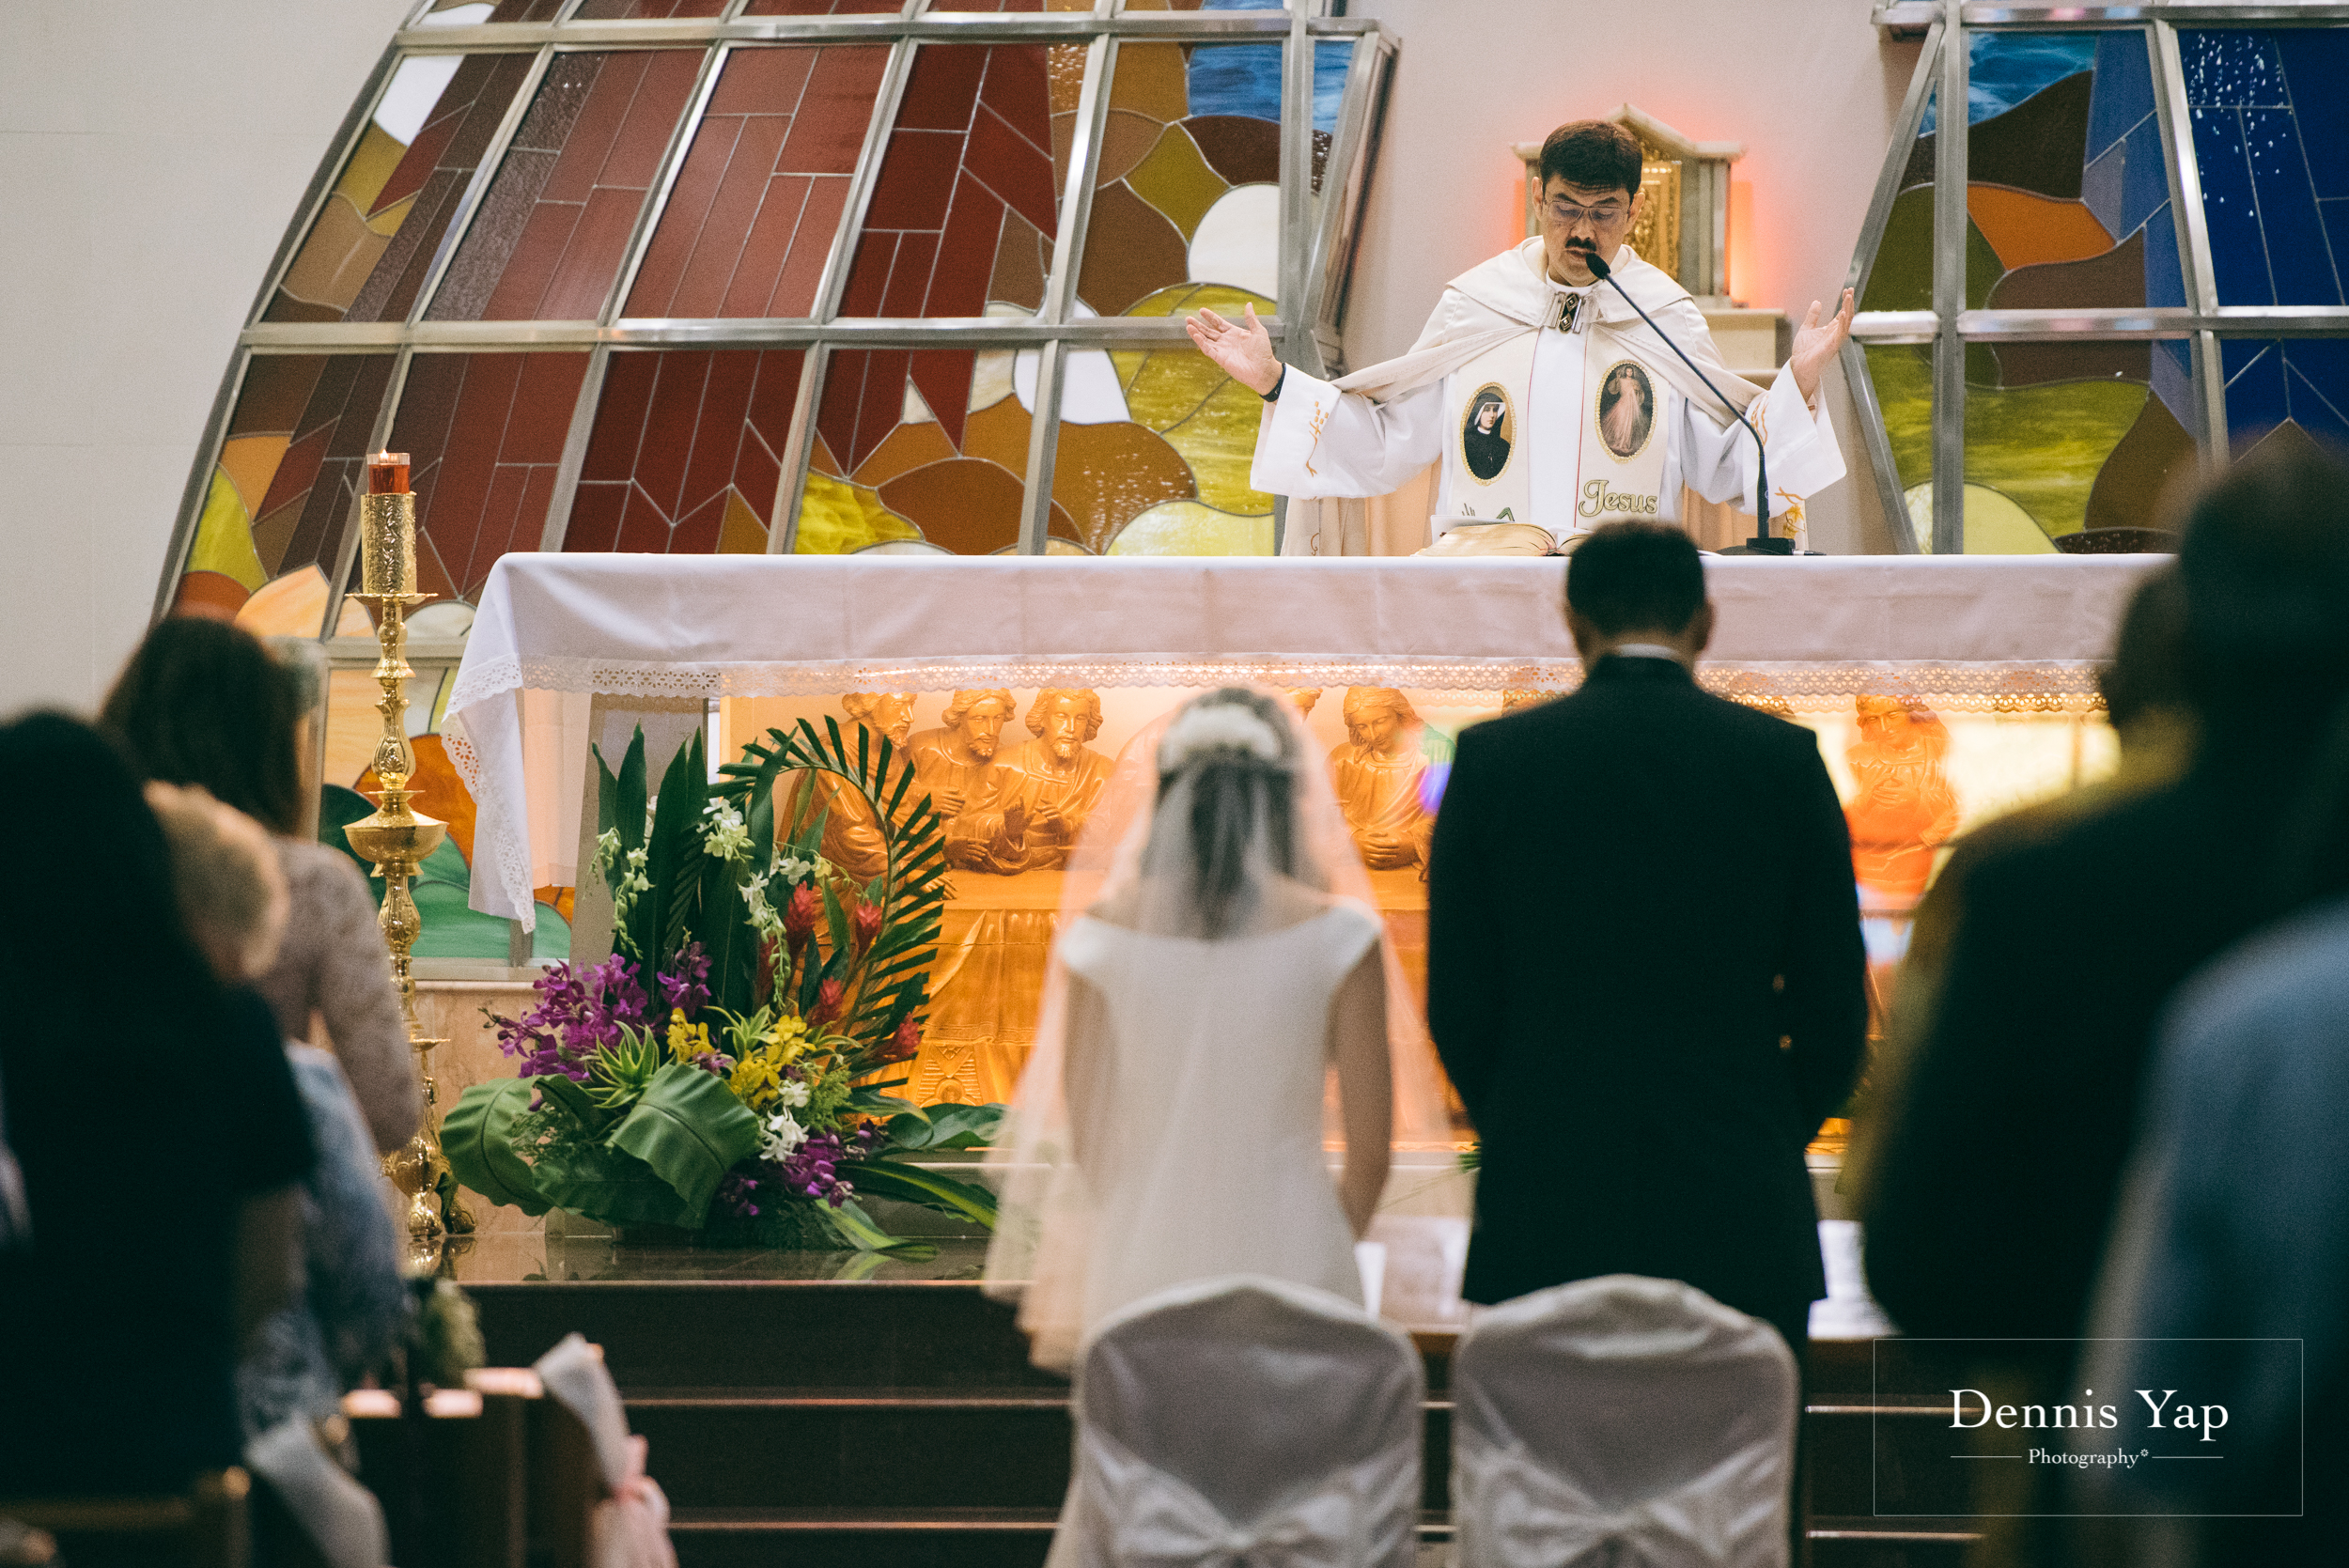 alroy teresa church wedding in church of divine mercy kuala lumpur malaysia wedding photographer dennis yap-13.jpg